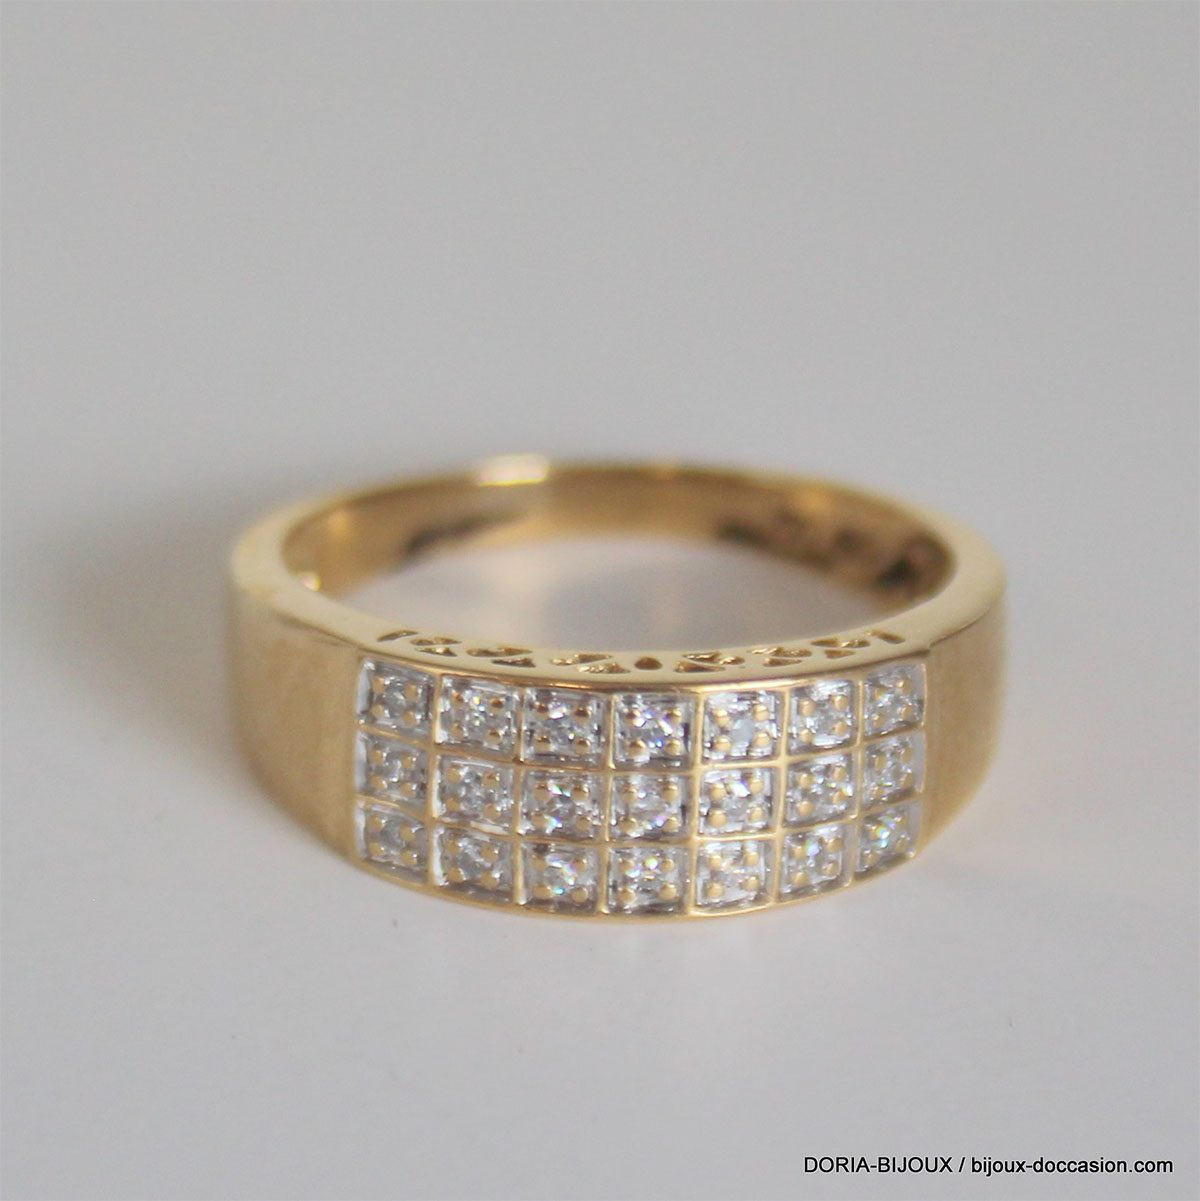 Bague Or Bicolore 18k Pavage Diamants-3.5grs